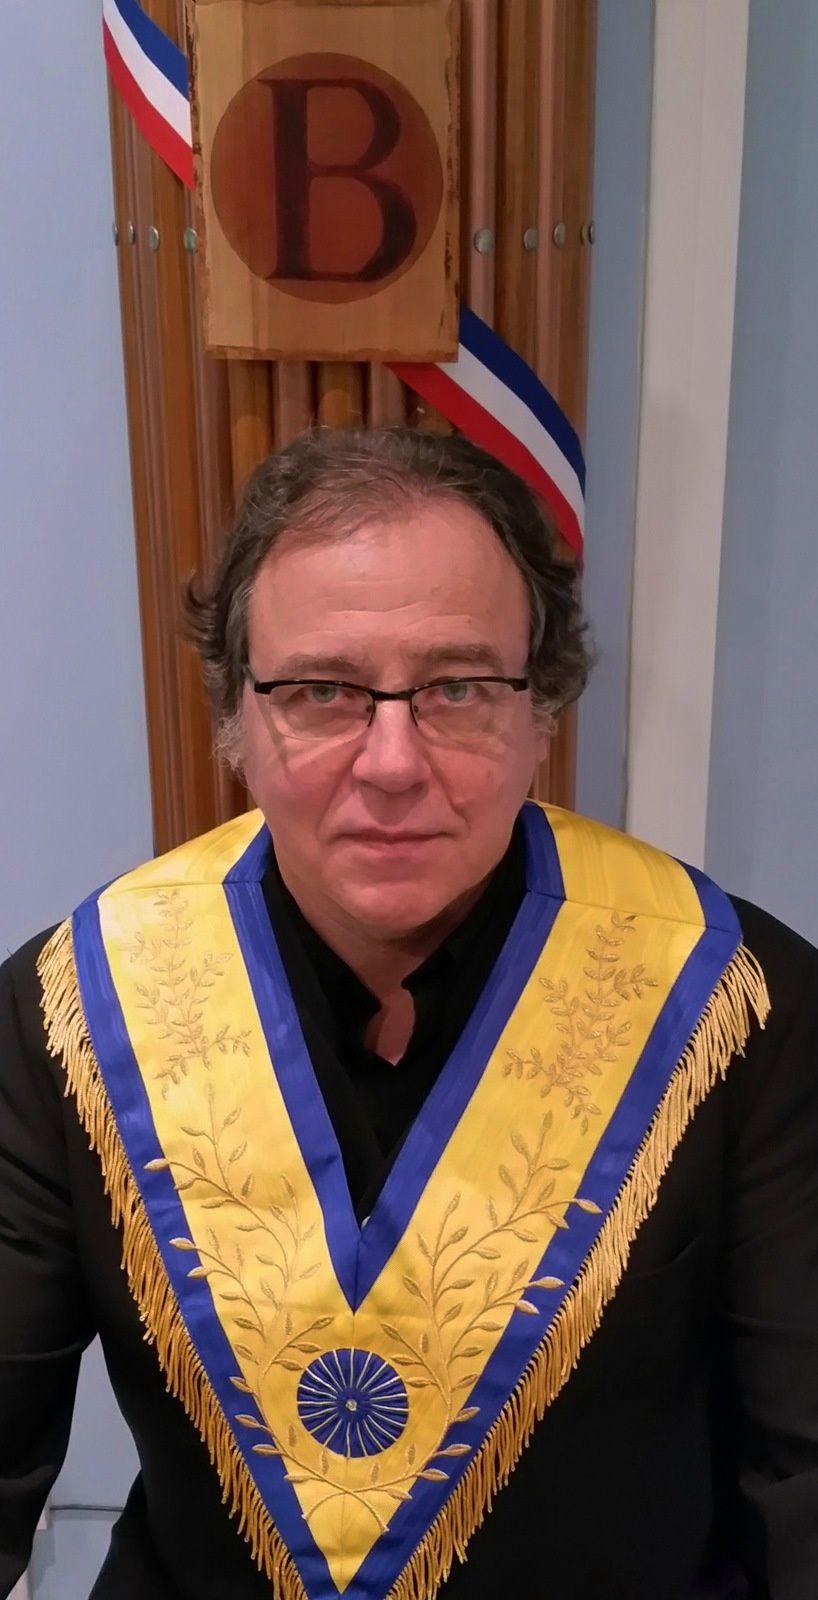 Alain Tirard, nouveau Grand Maître de la GLMU